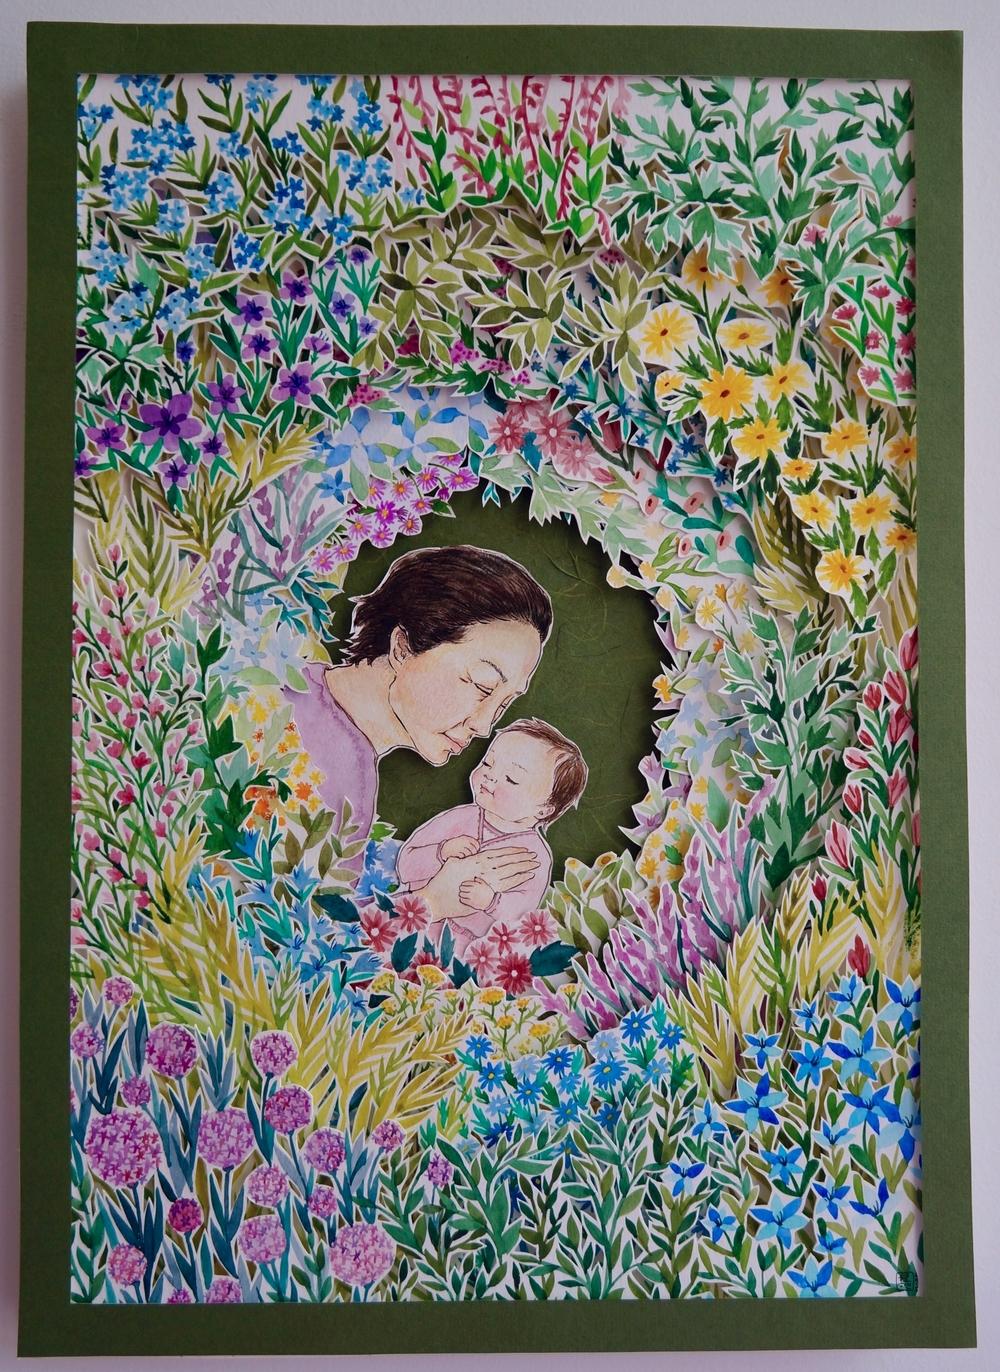 With Grandma in Flower Garden I